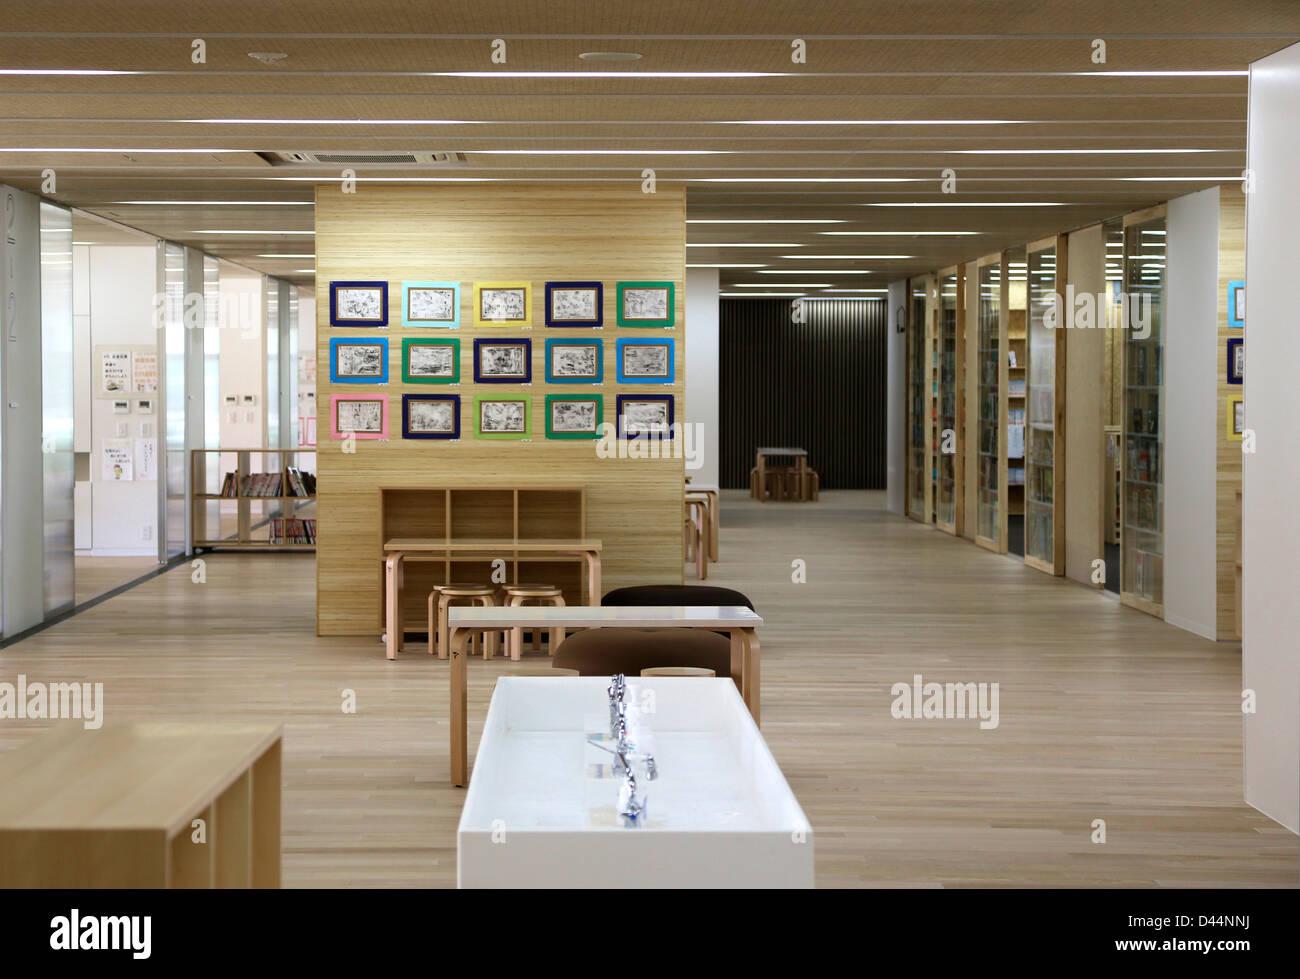 Lovely Teikyo University Elementary School, Tokyo, Japan. Architect: Kengo Kuma,  2012. Interior View Main Corridor On Ground Floor.